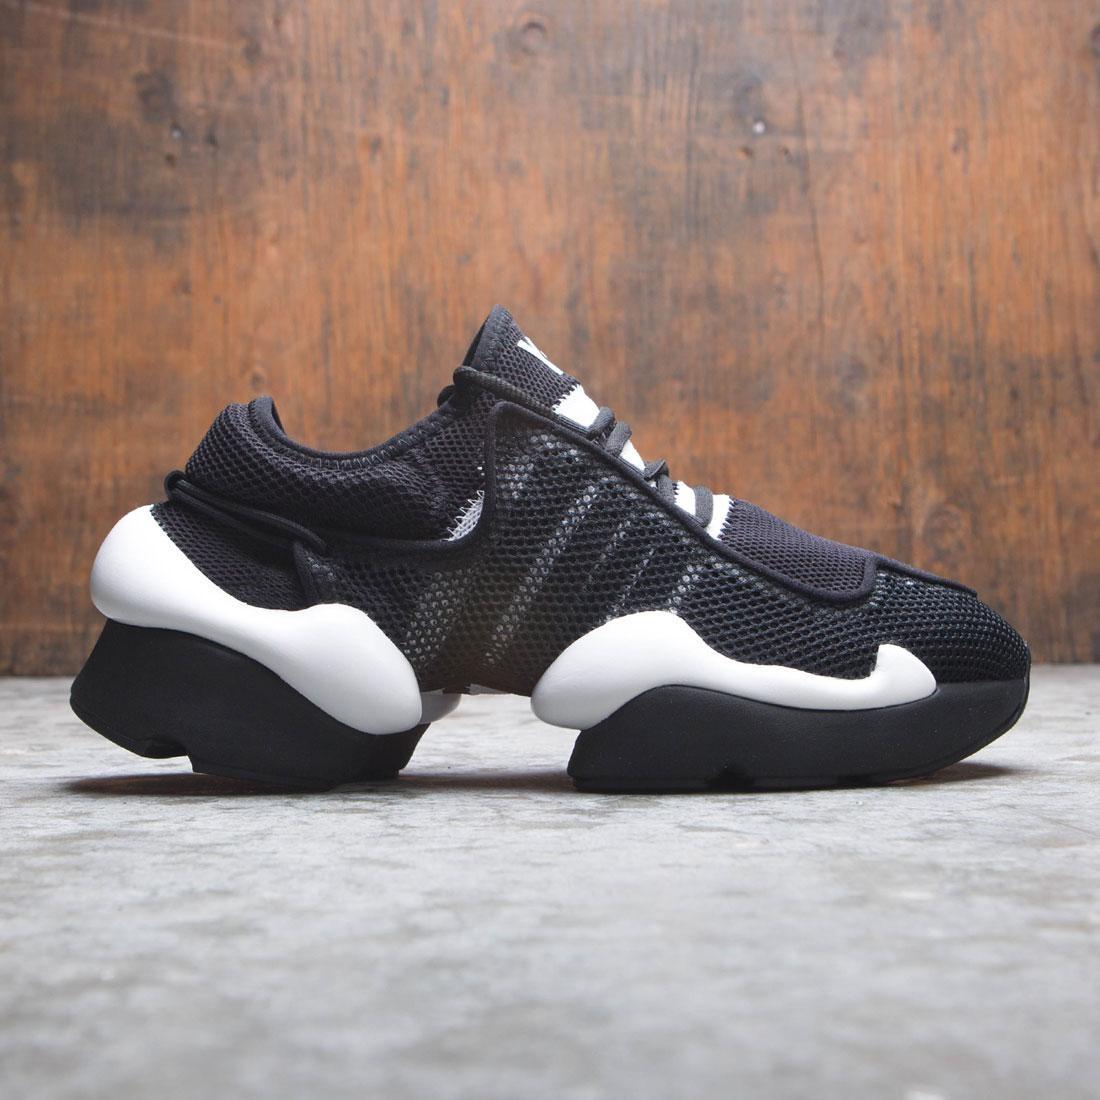 Adidas Y-3 Men Ren (black / core black / footwear white)